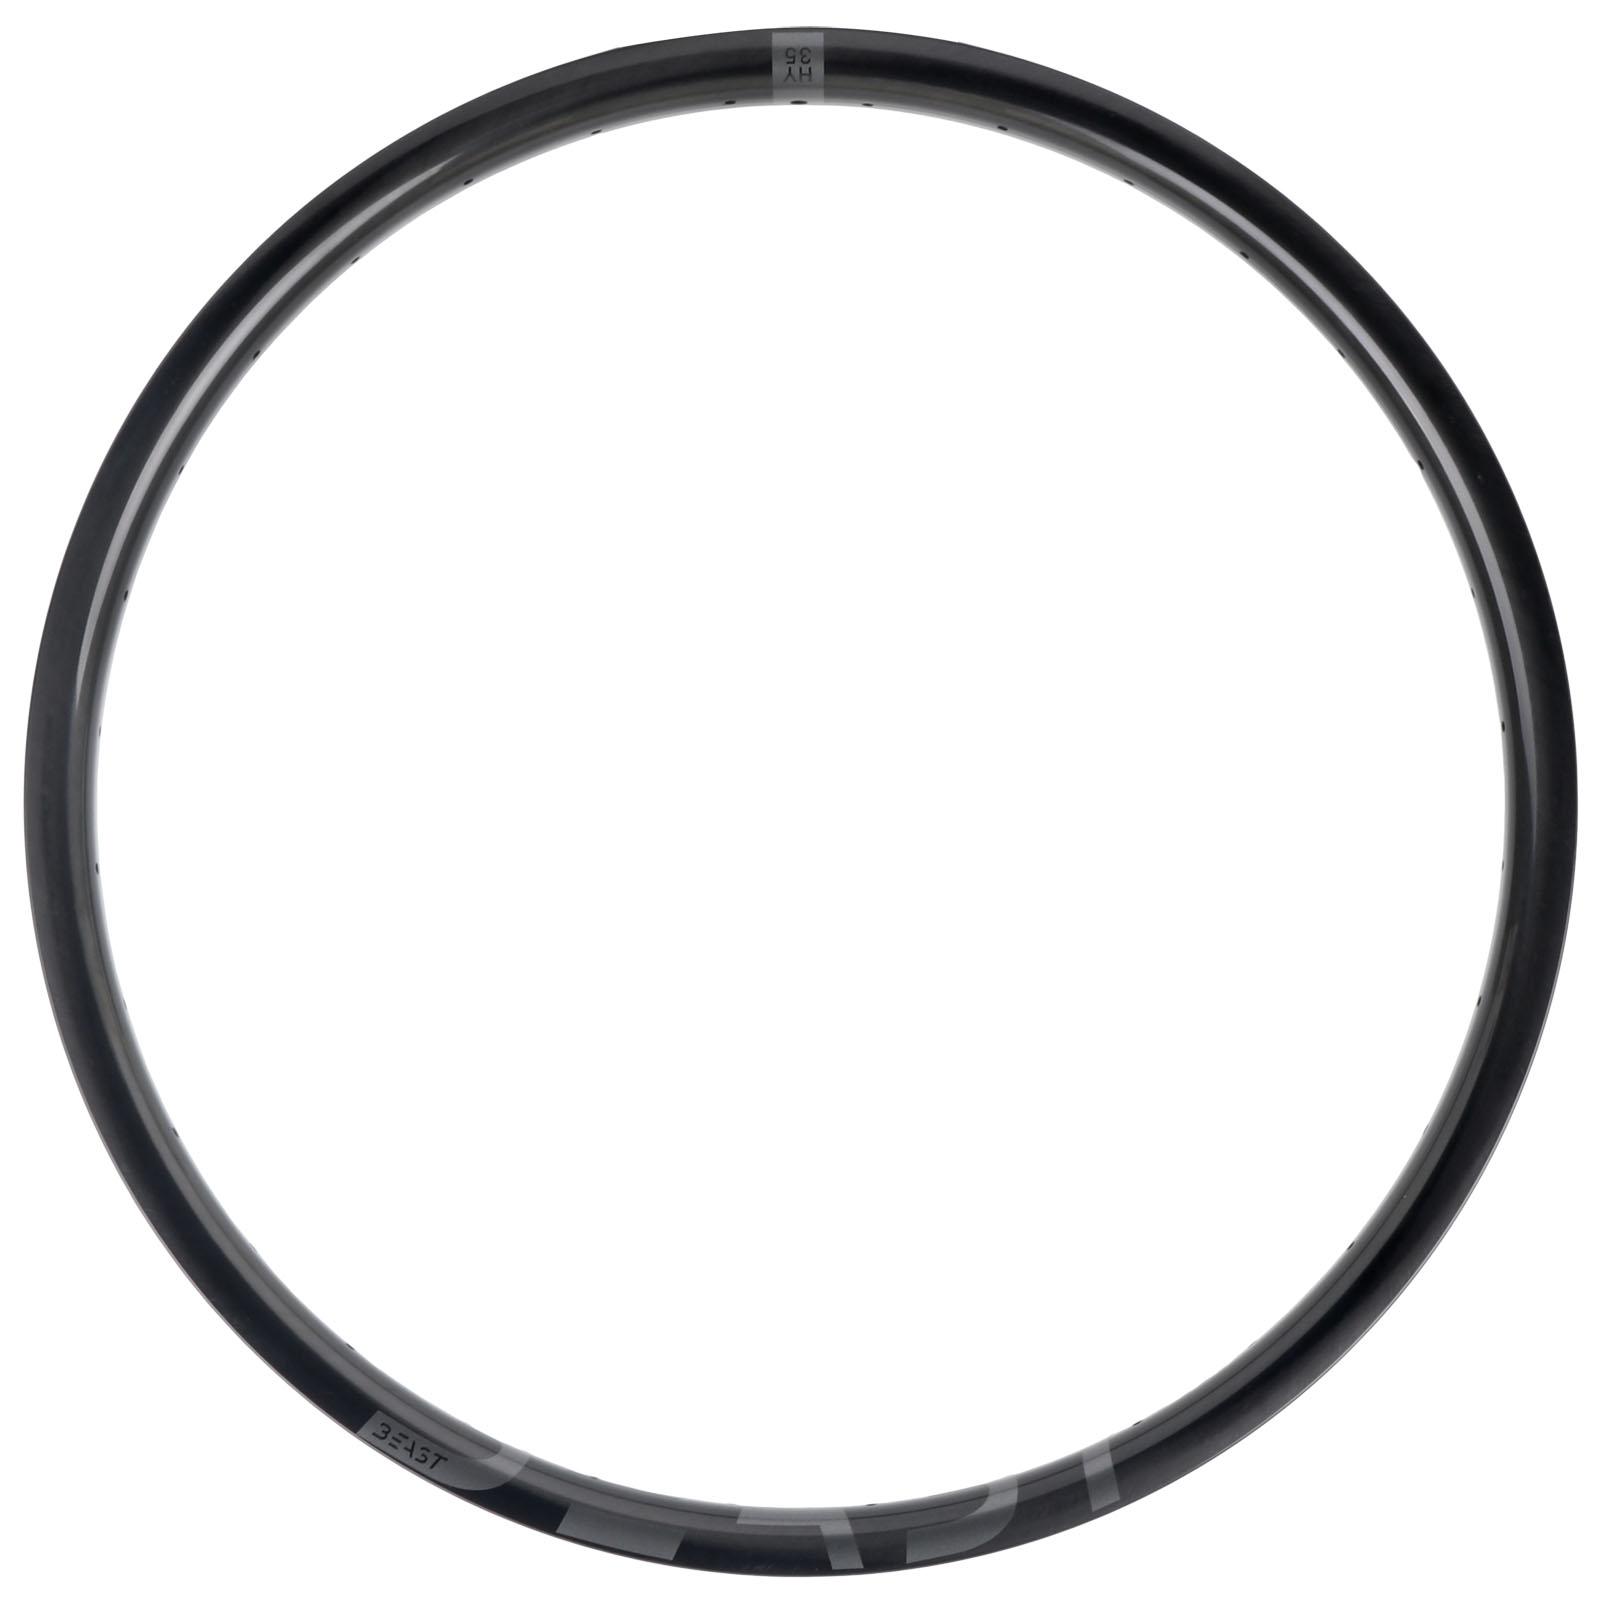 Beast Components HY35 29 Inch Carbon E-MTB Rim - UD black